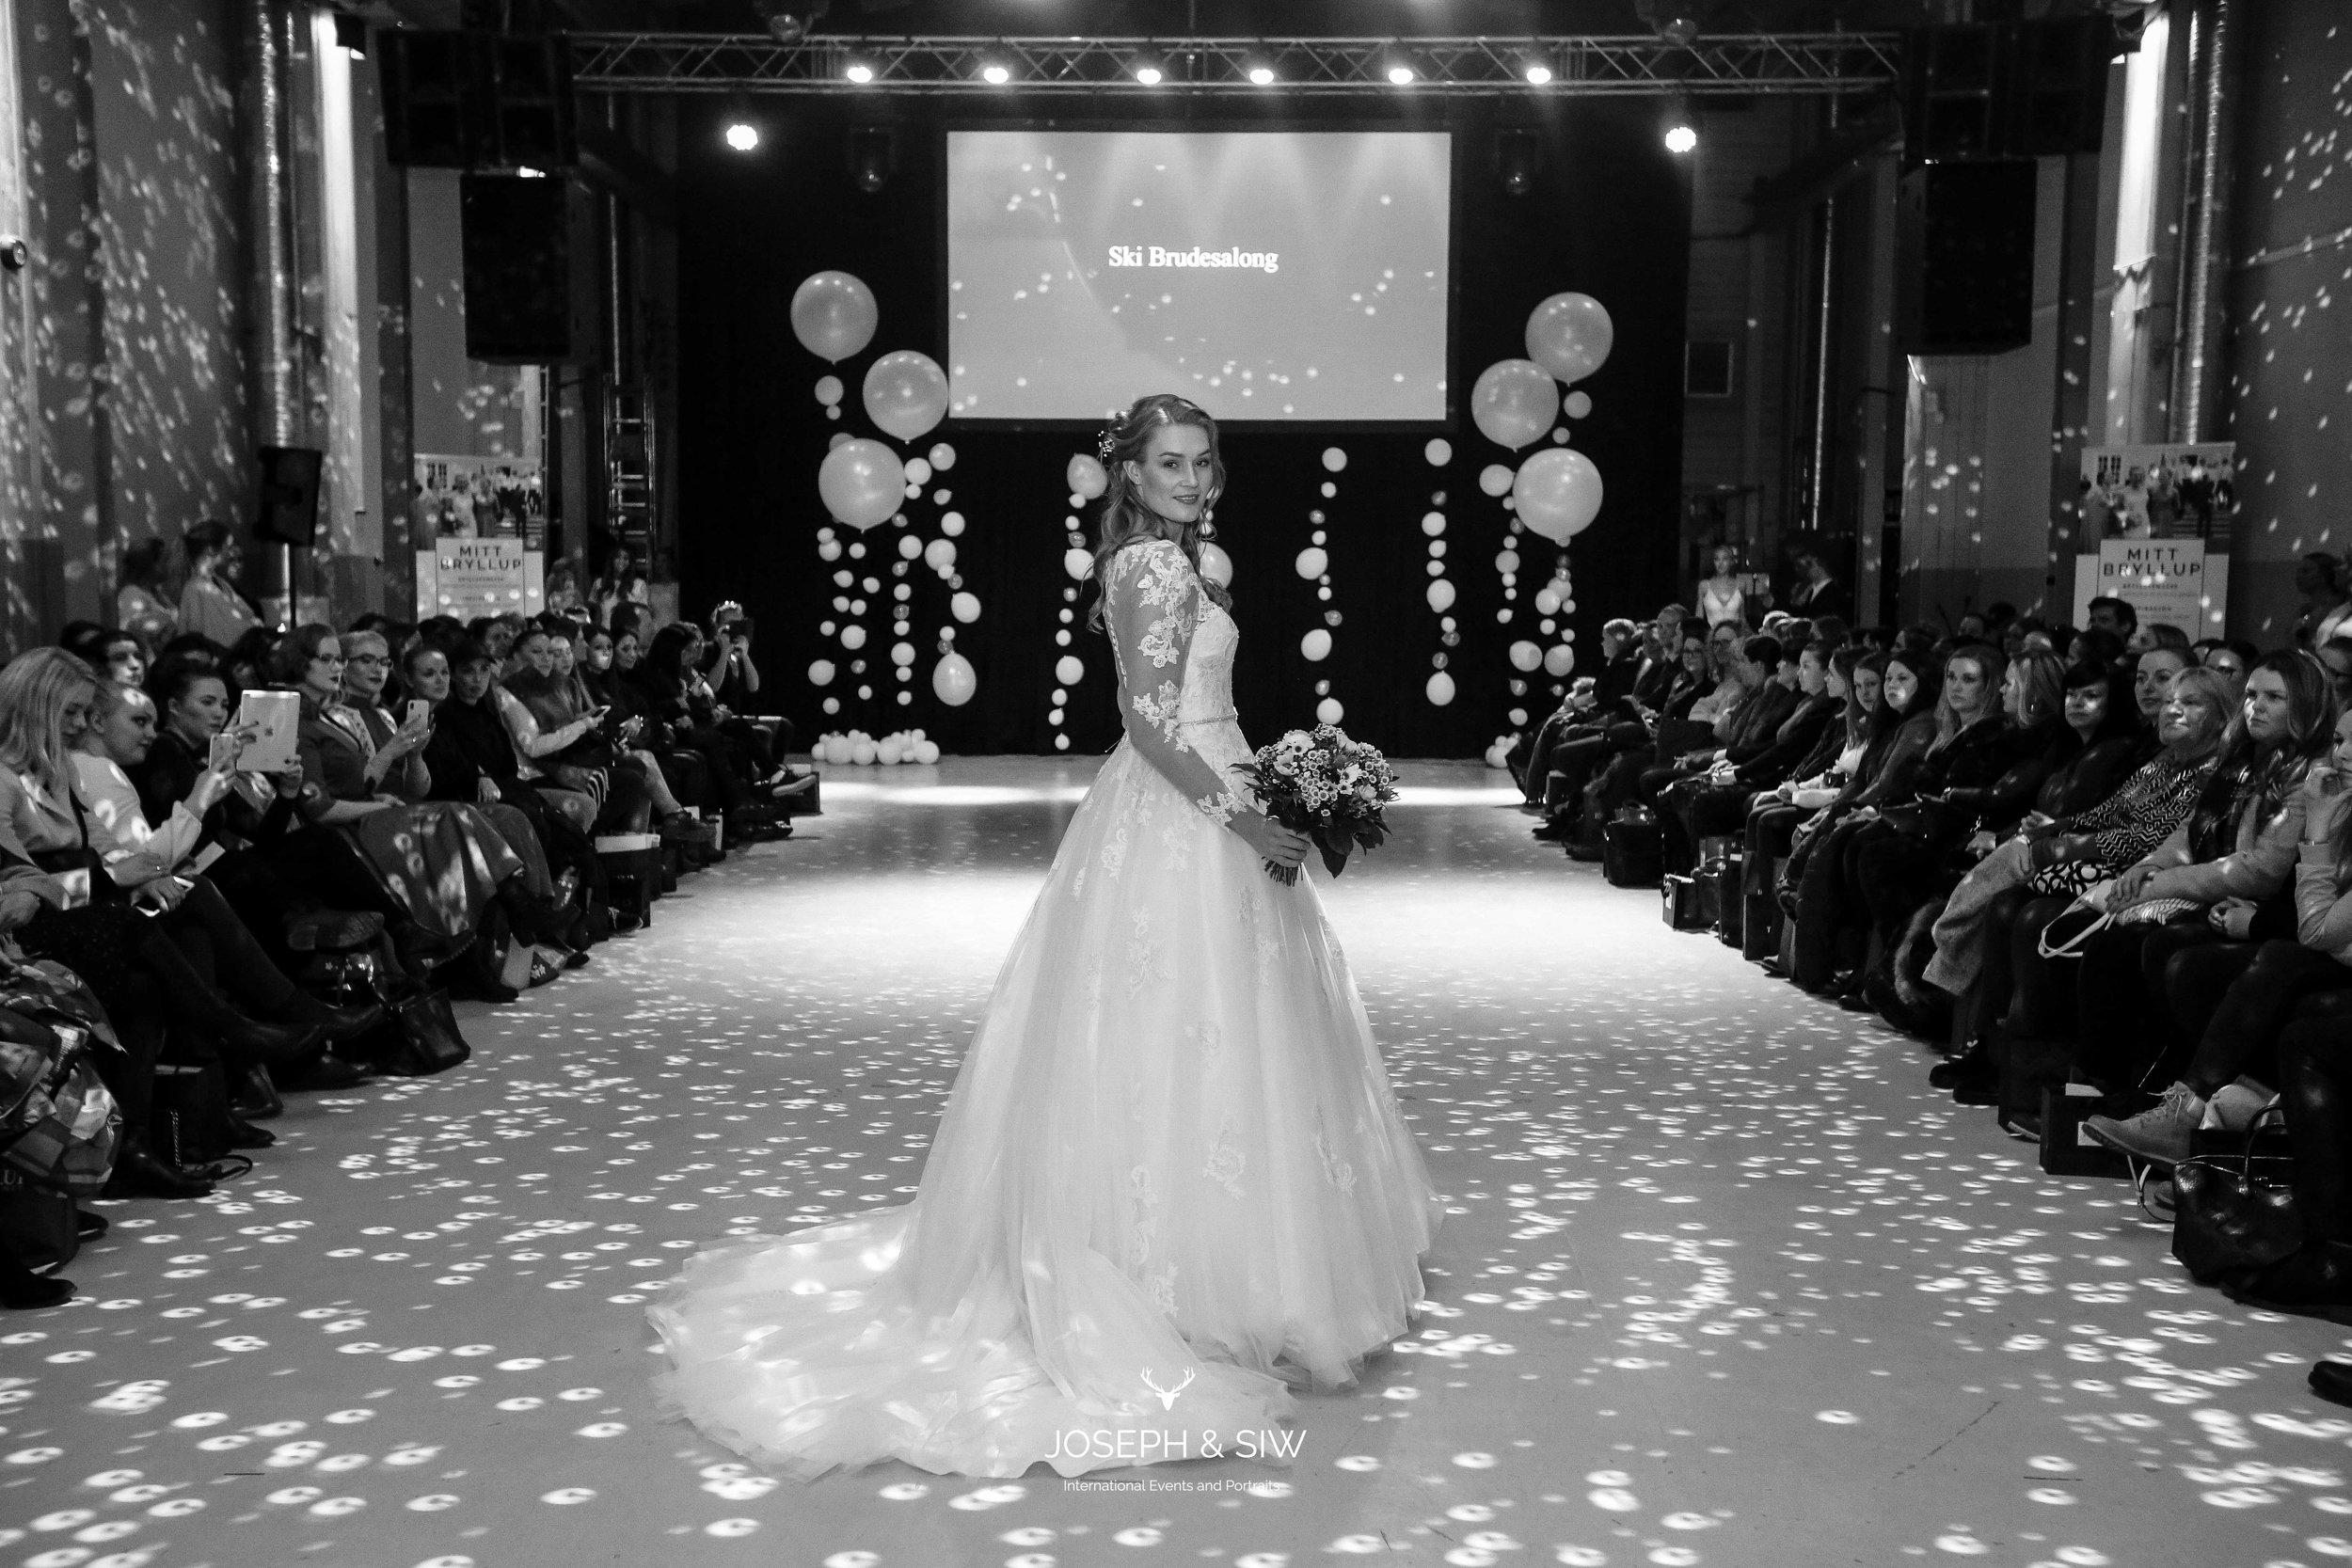 mittbryllup_bryllupsmesse_i_oslo_246.jpg